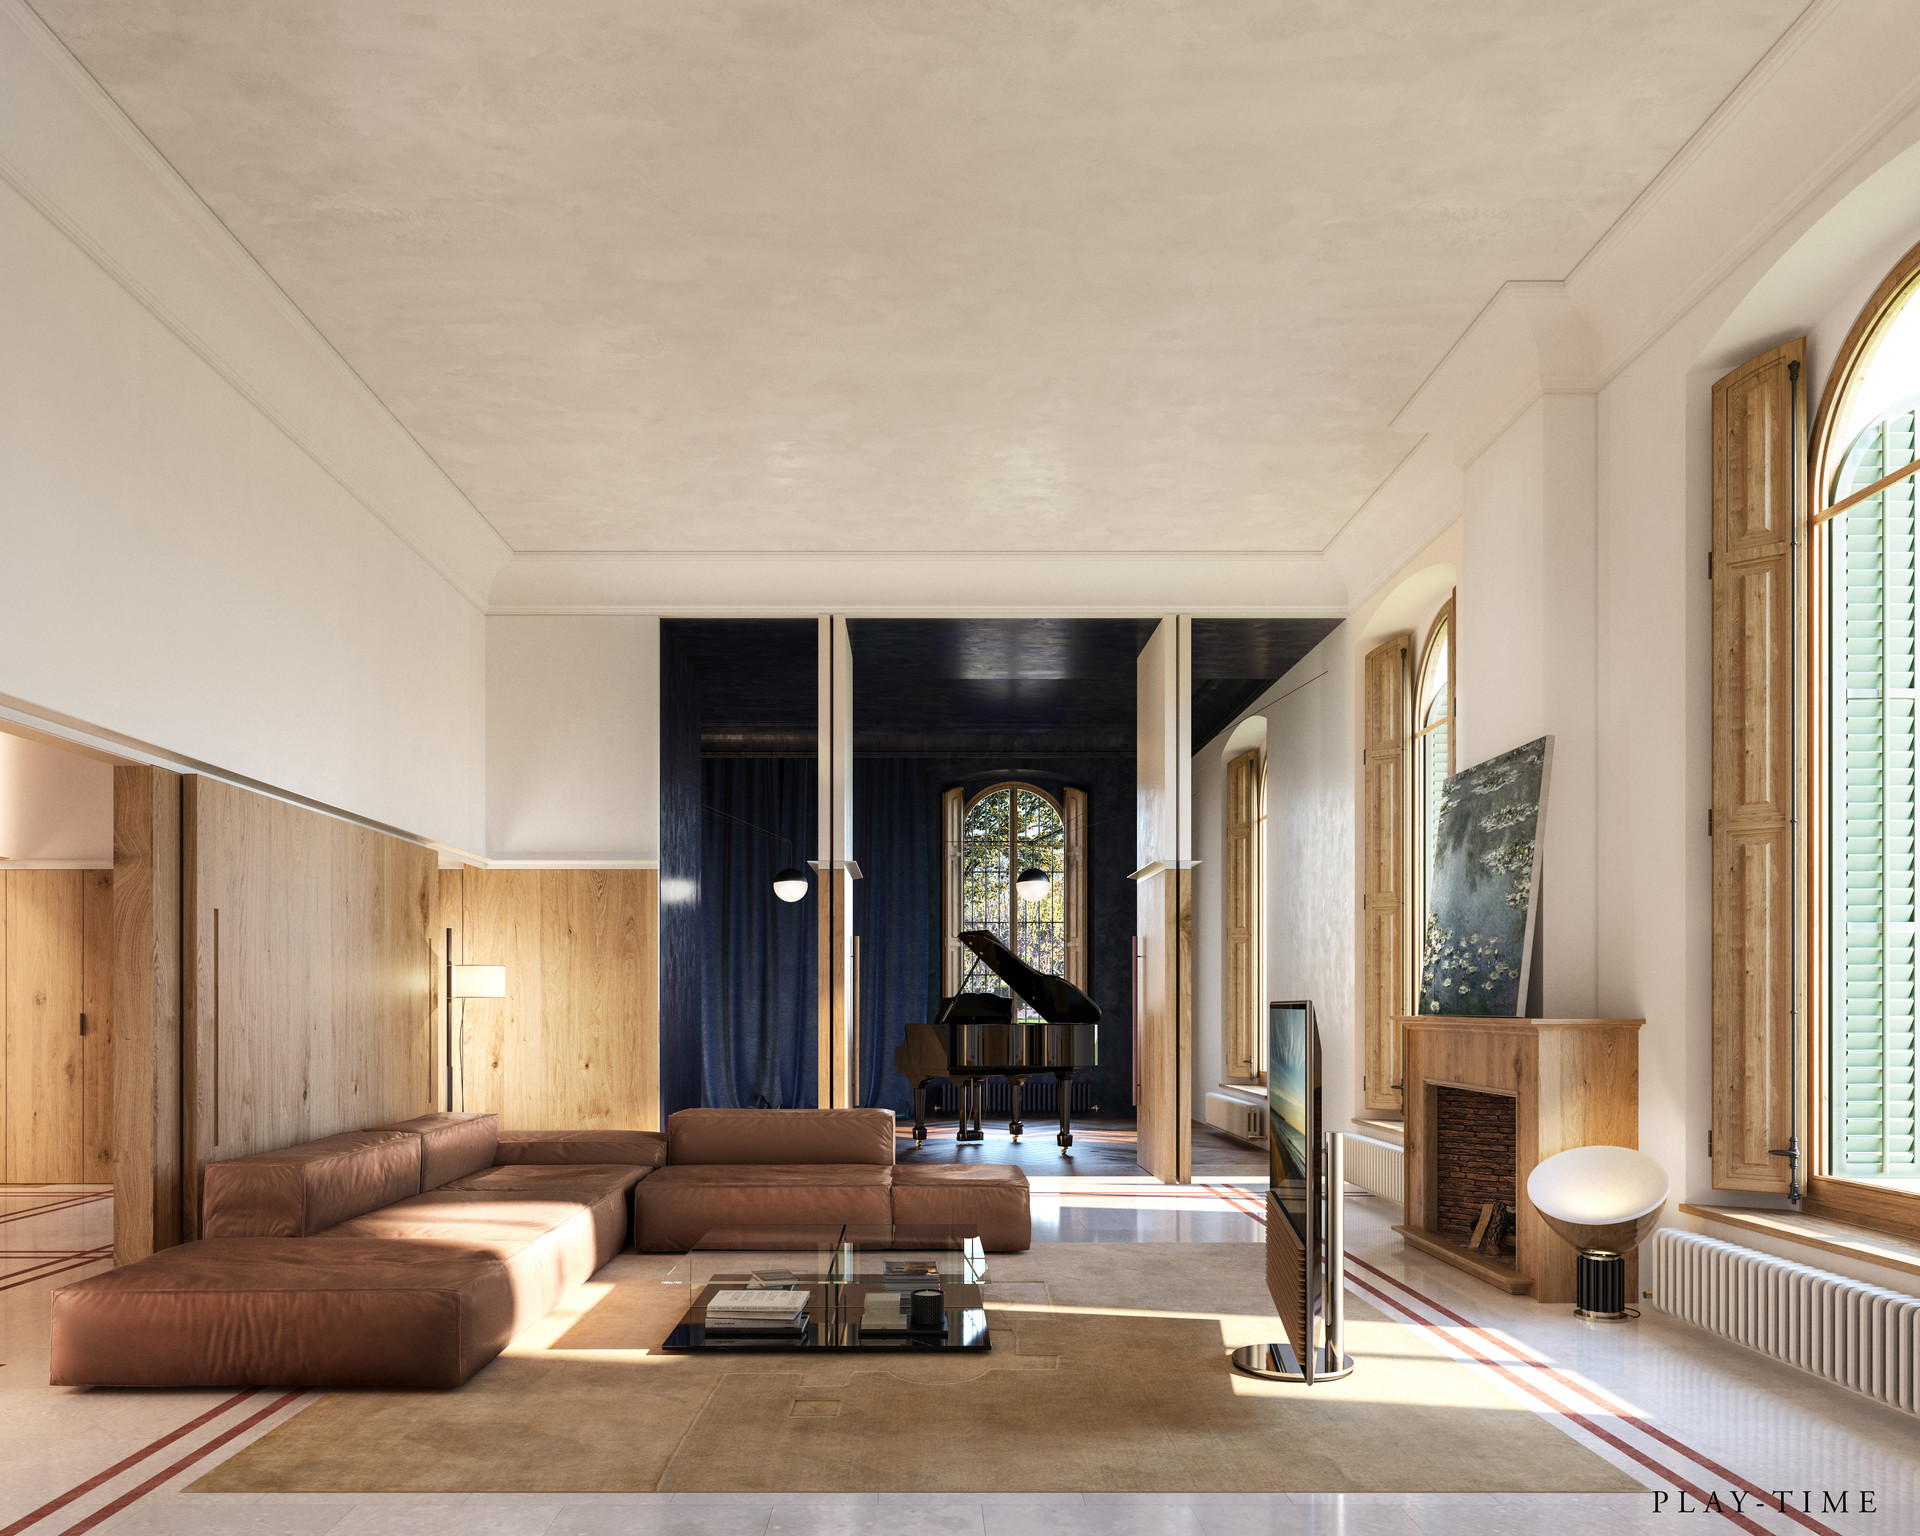 Play time architectonic image mesura house renovation alella 04